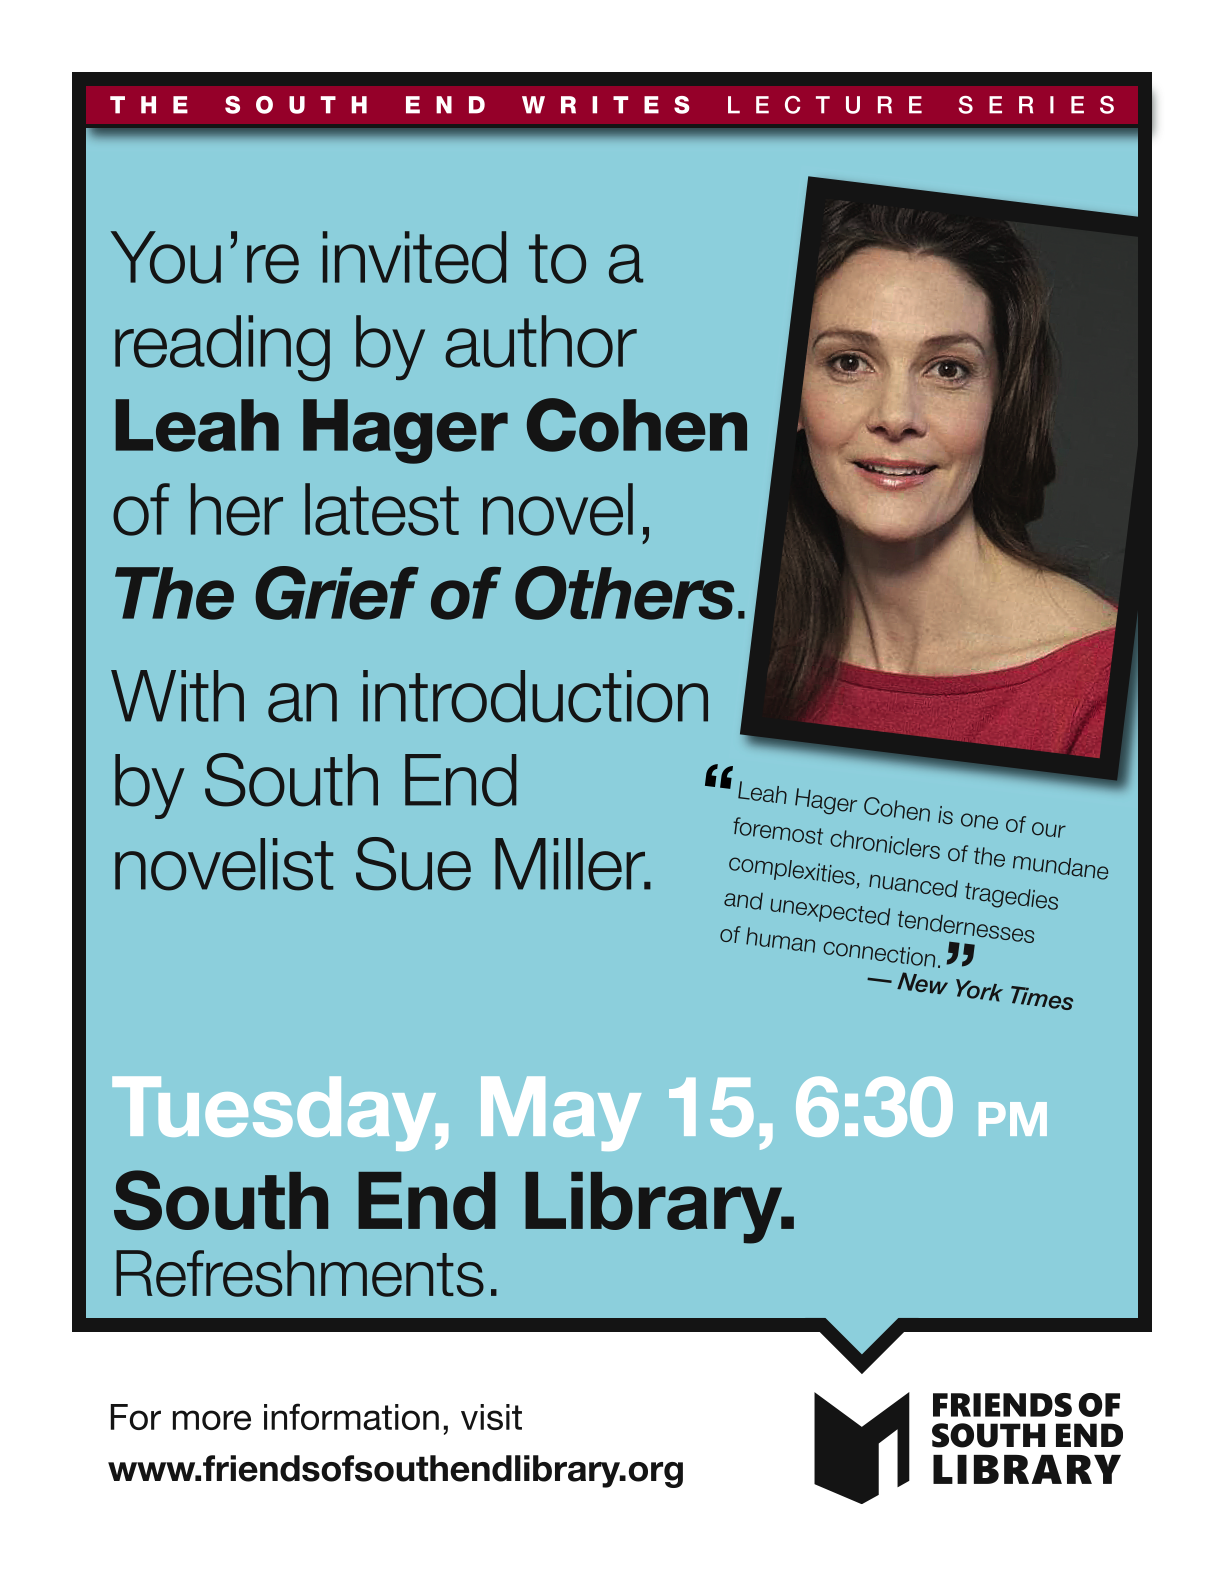 FOSEL _Leah Hager Cohen flyer_5-15-12.png